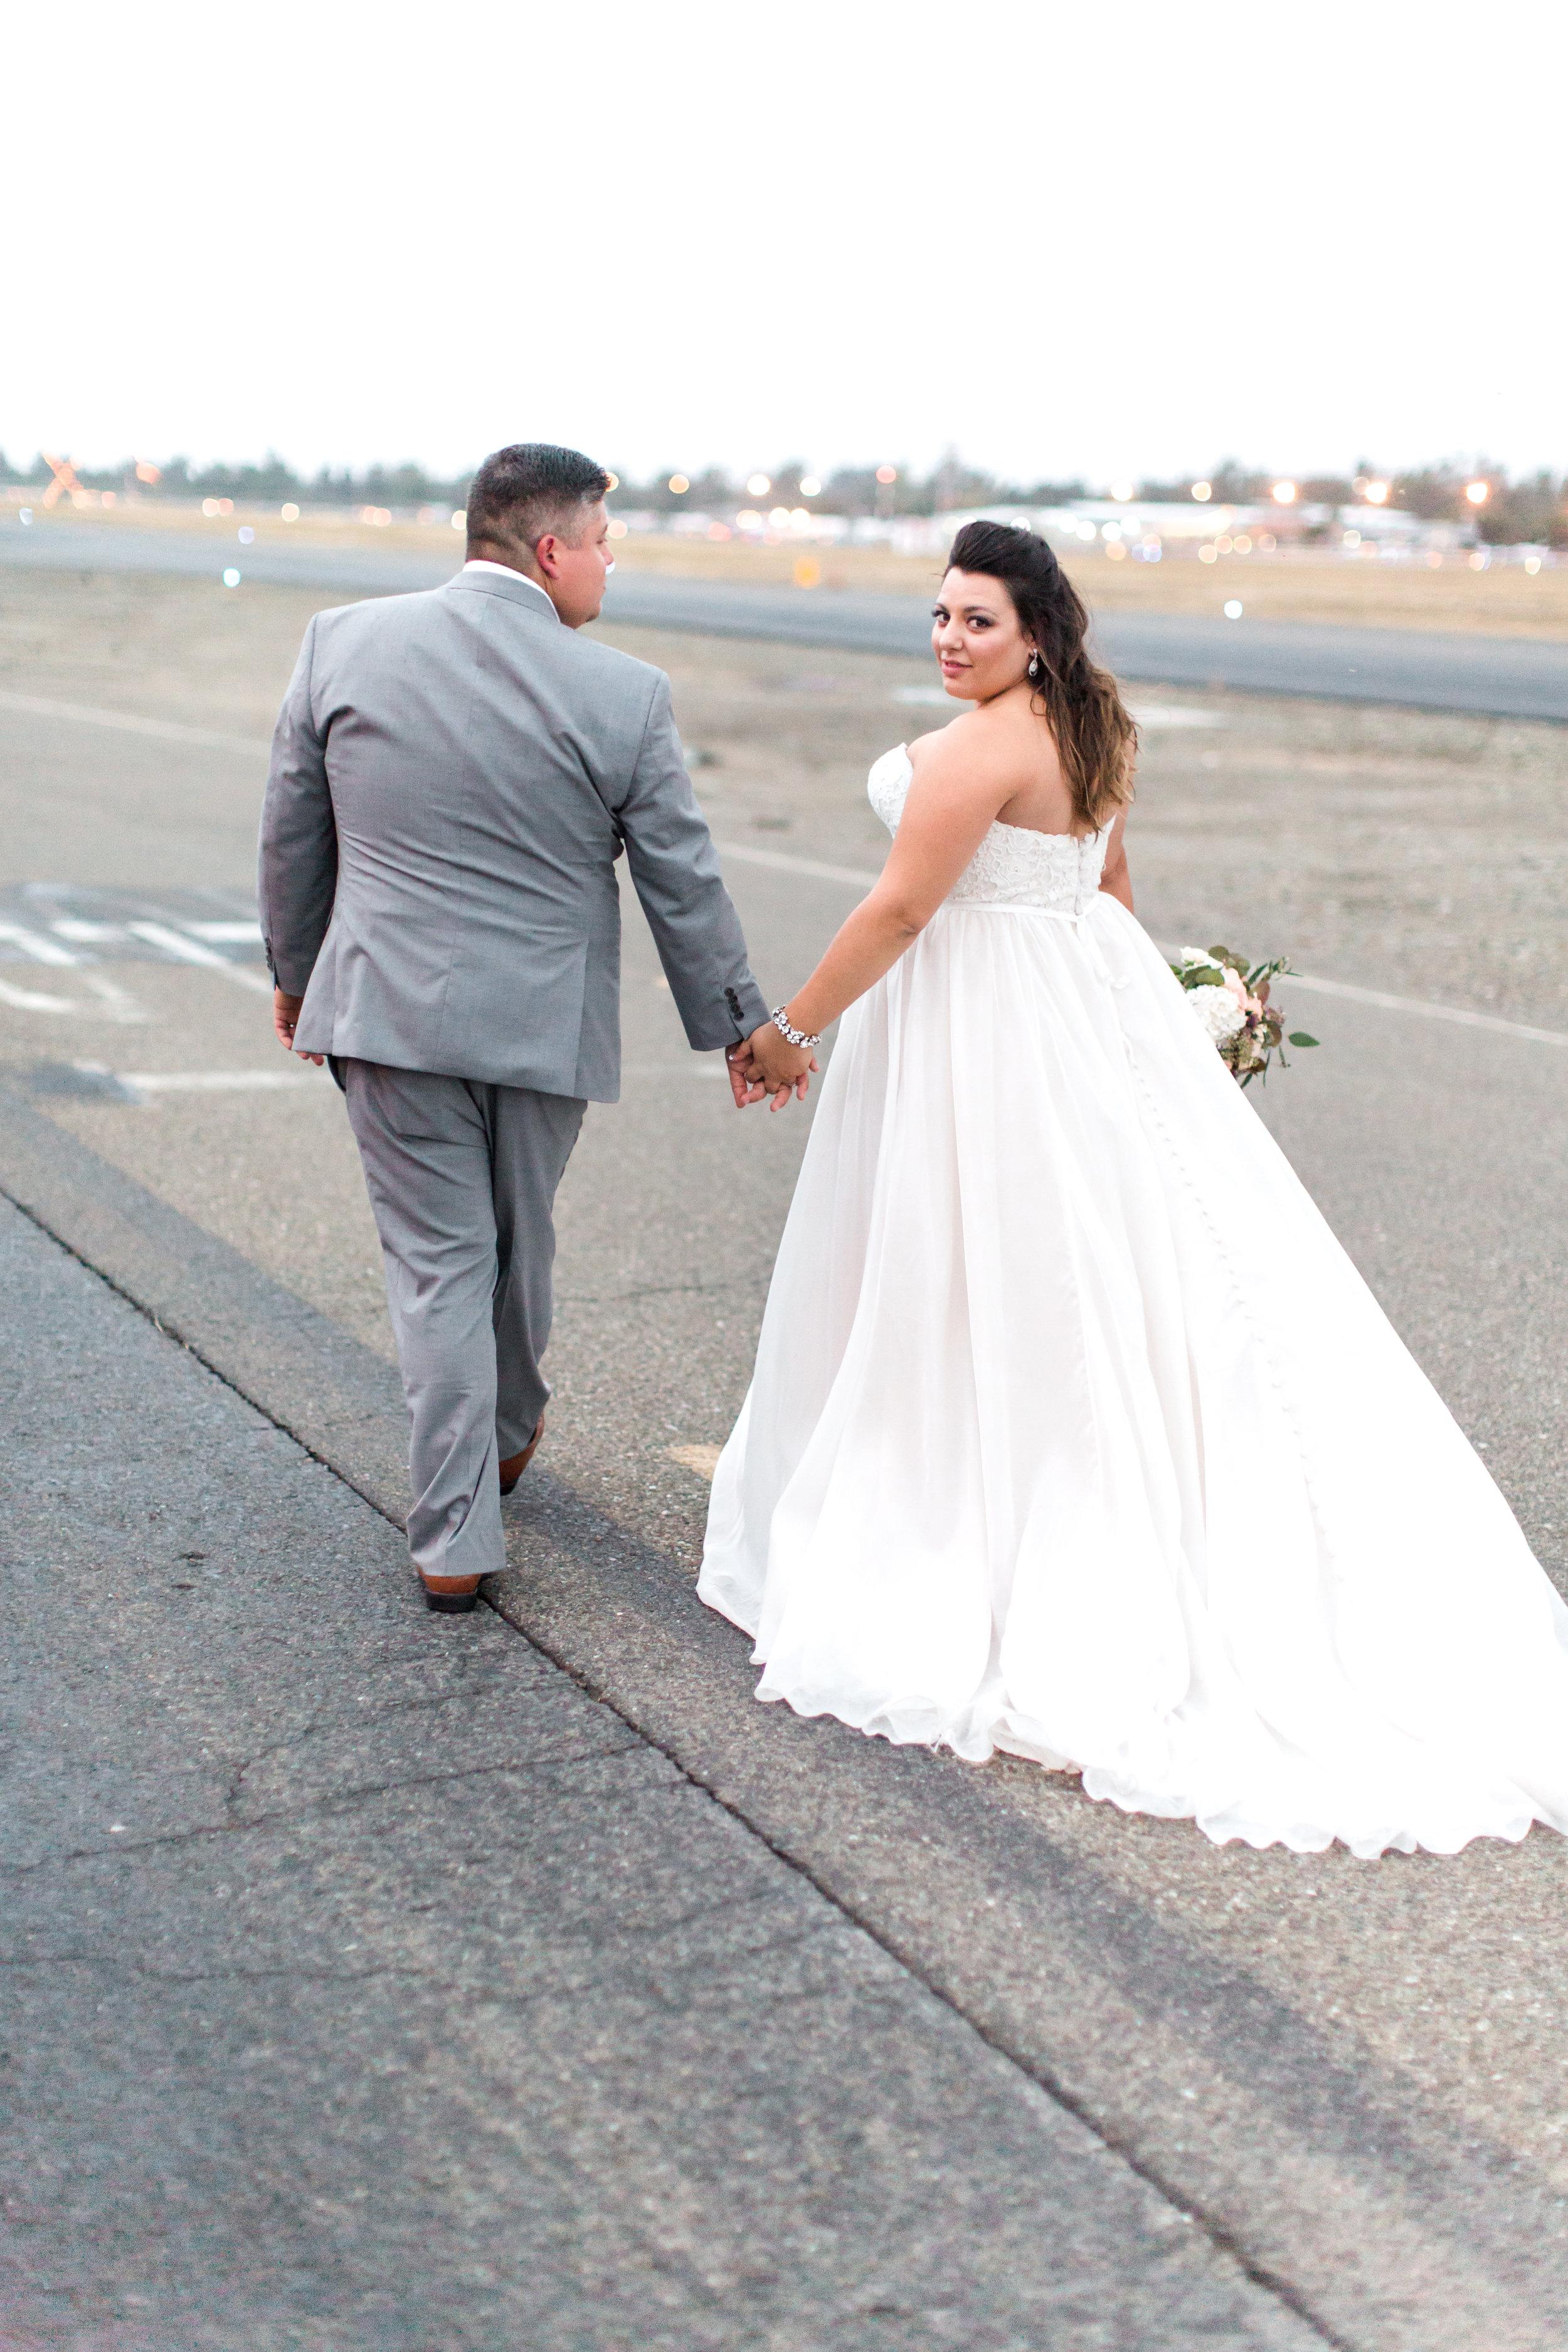 airport-hanger-wedding-at-attitude-aviation-in-livermore-116.jpg